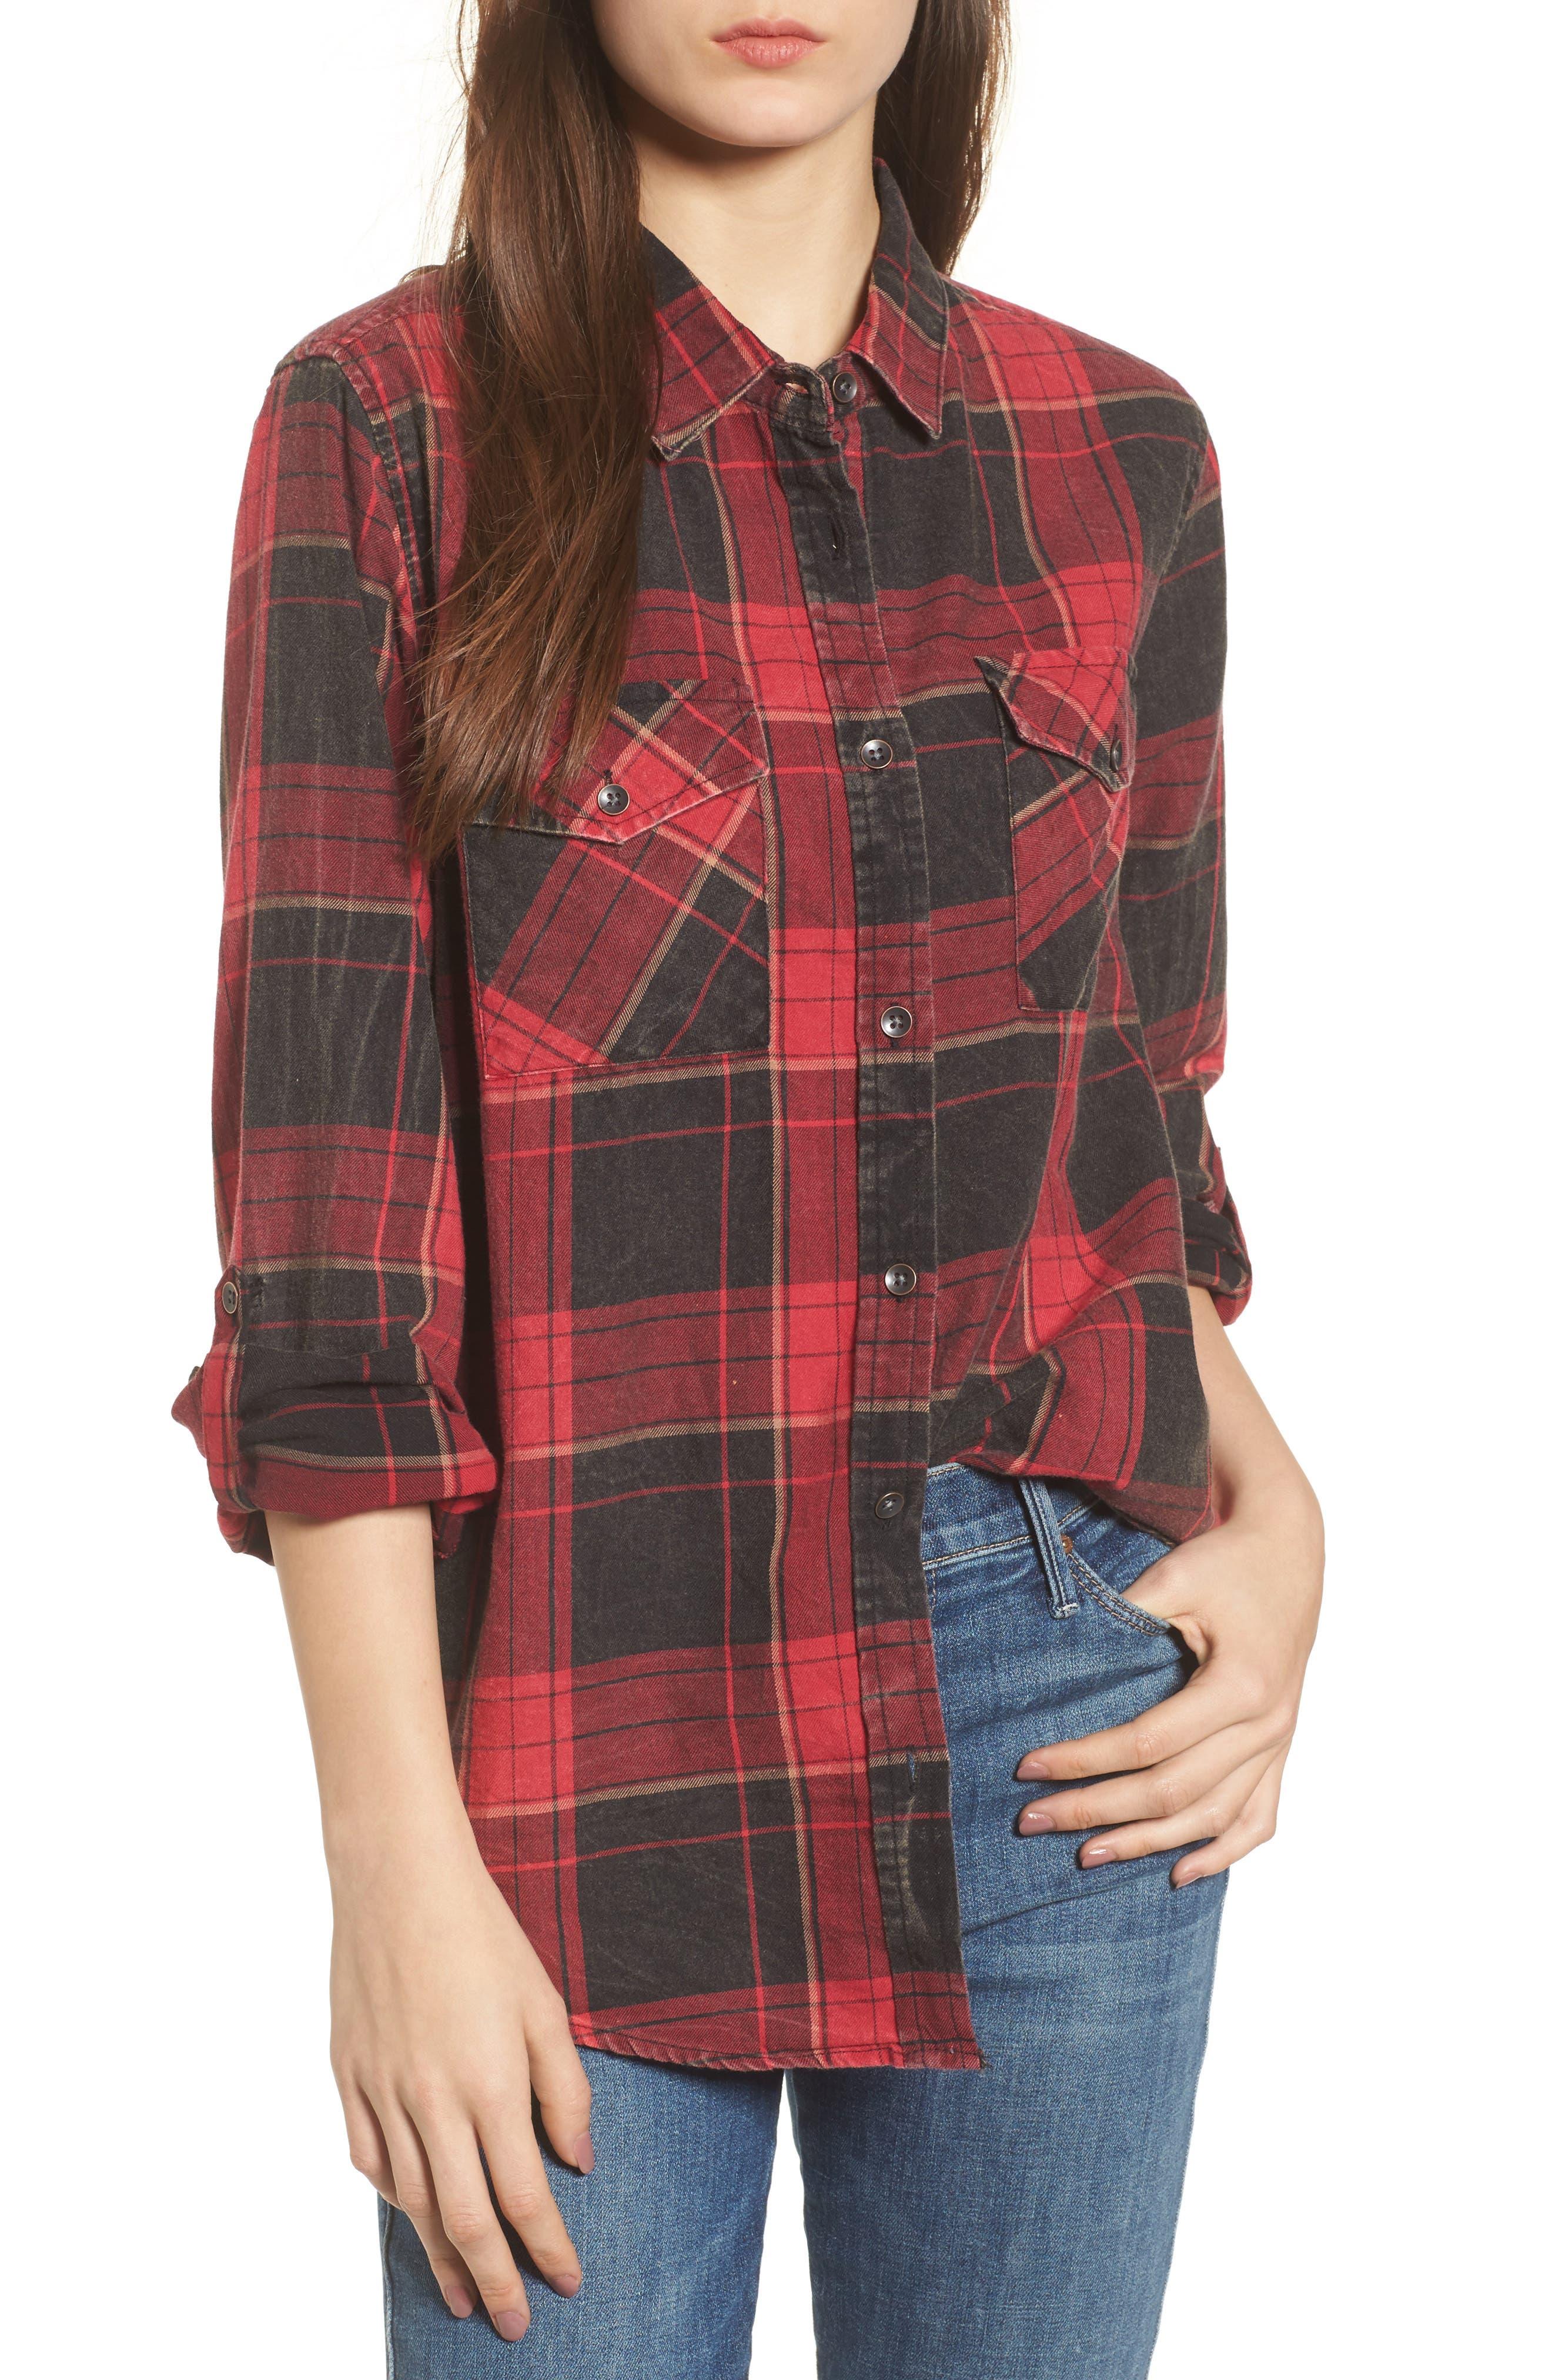 Hendrix Plaid Shirt,                         Main,                         color, Red/ Black